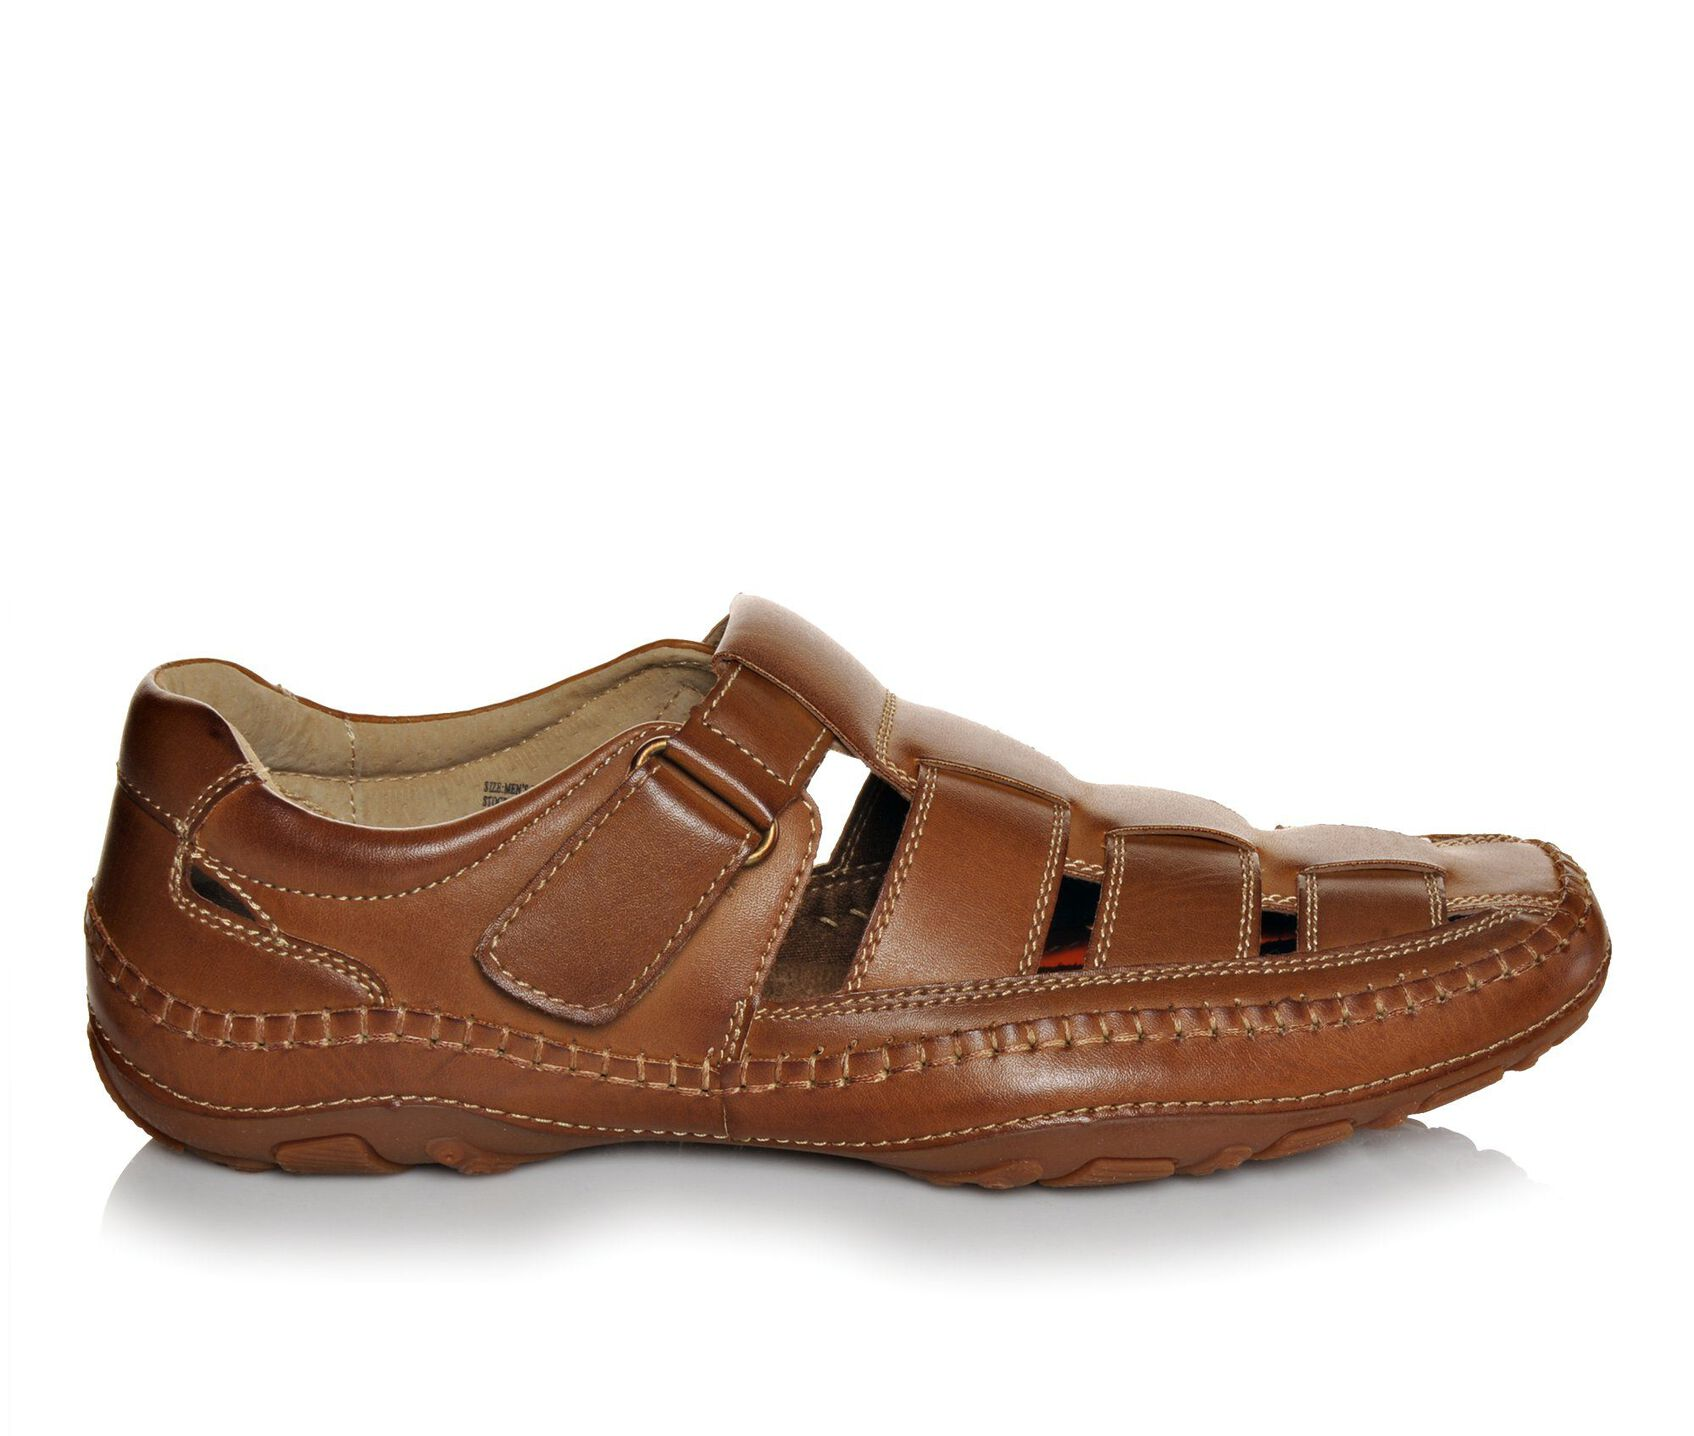 801331e4c4cc Men s GBX Sentaur Sandals